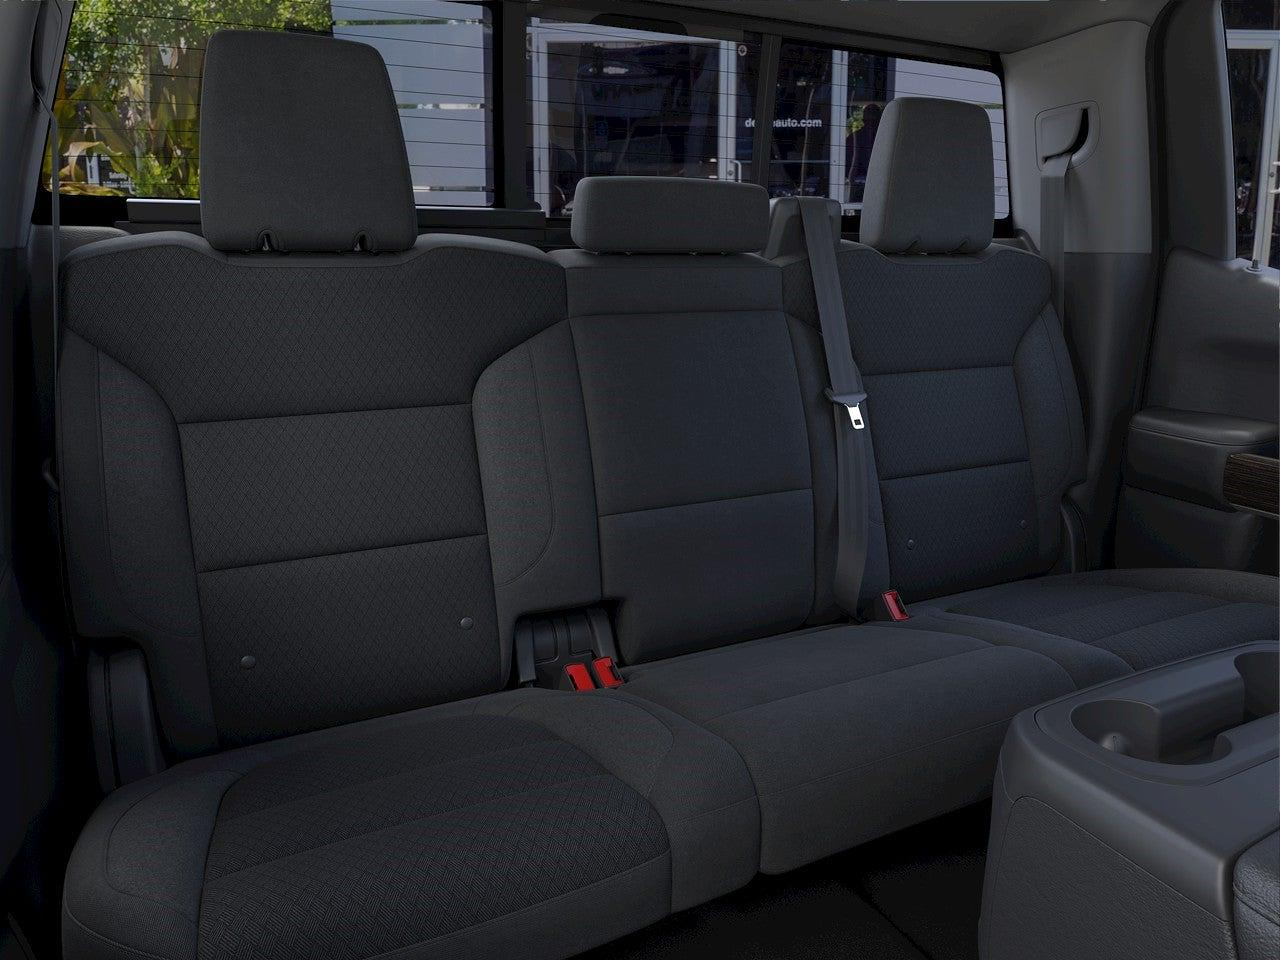 2021 GMC Sierra 1500 Double Cab 4x2, Pickup #T21367 - photo 14